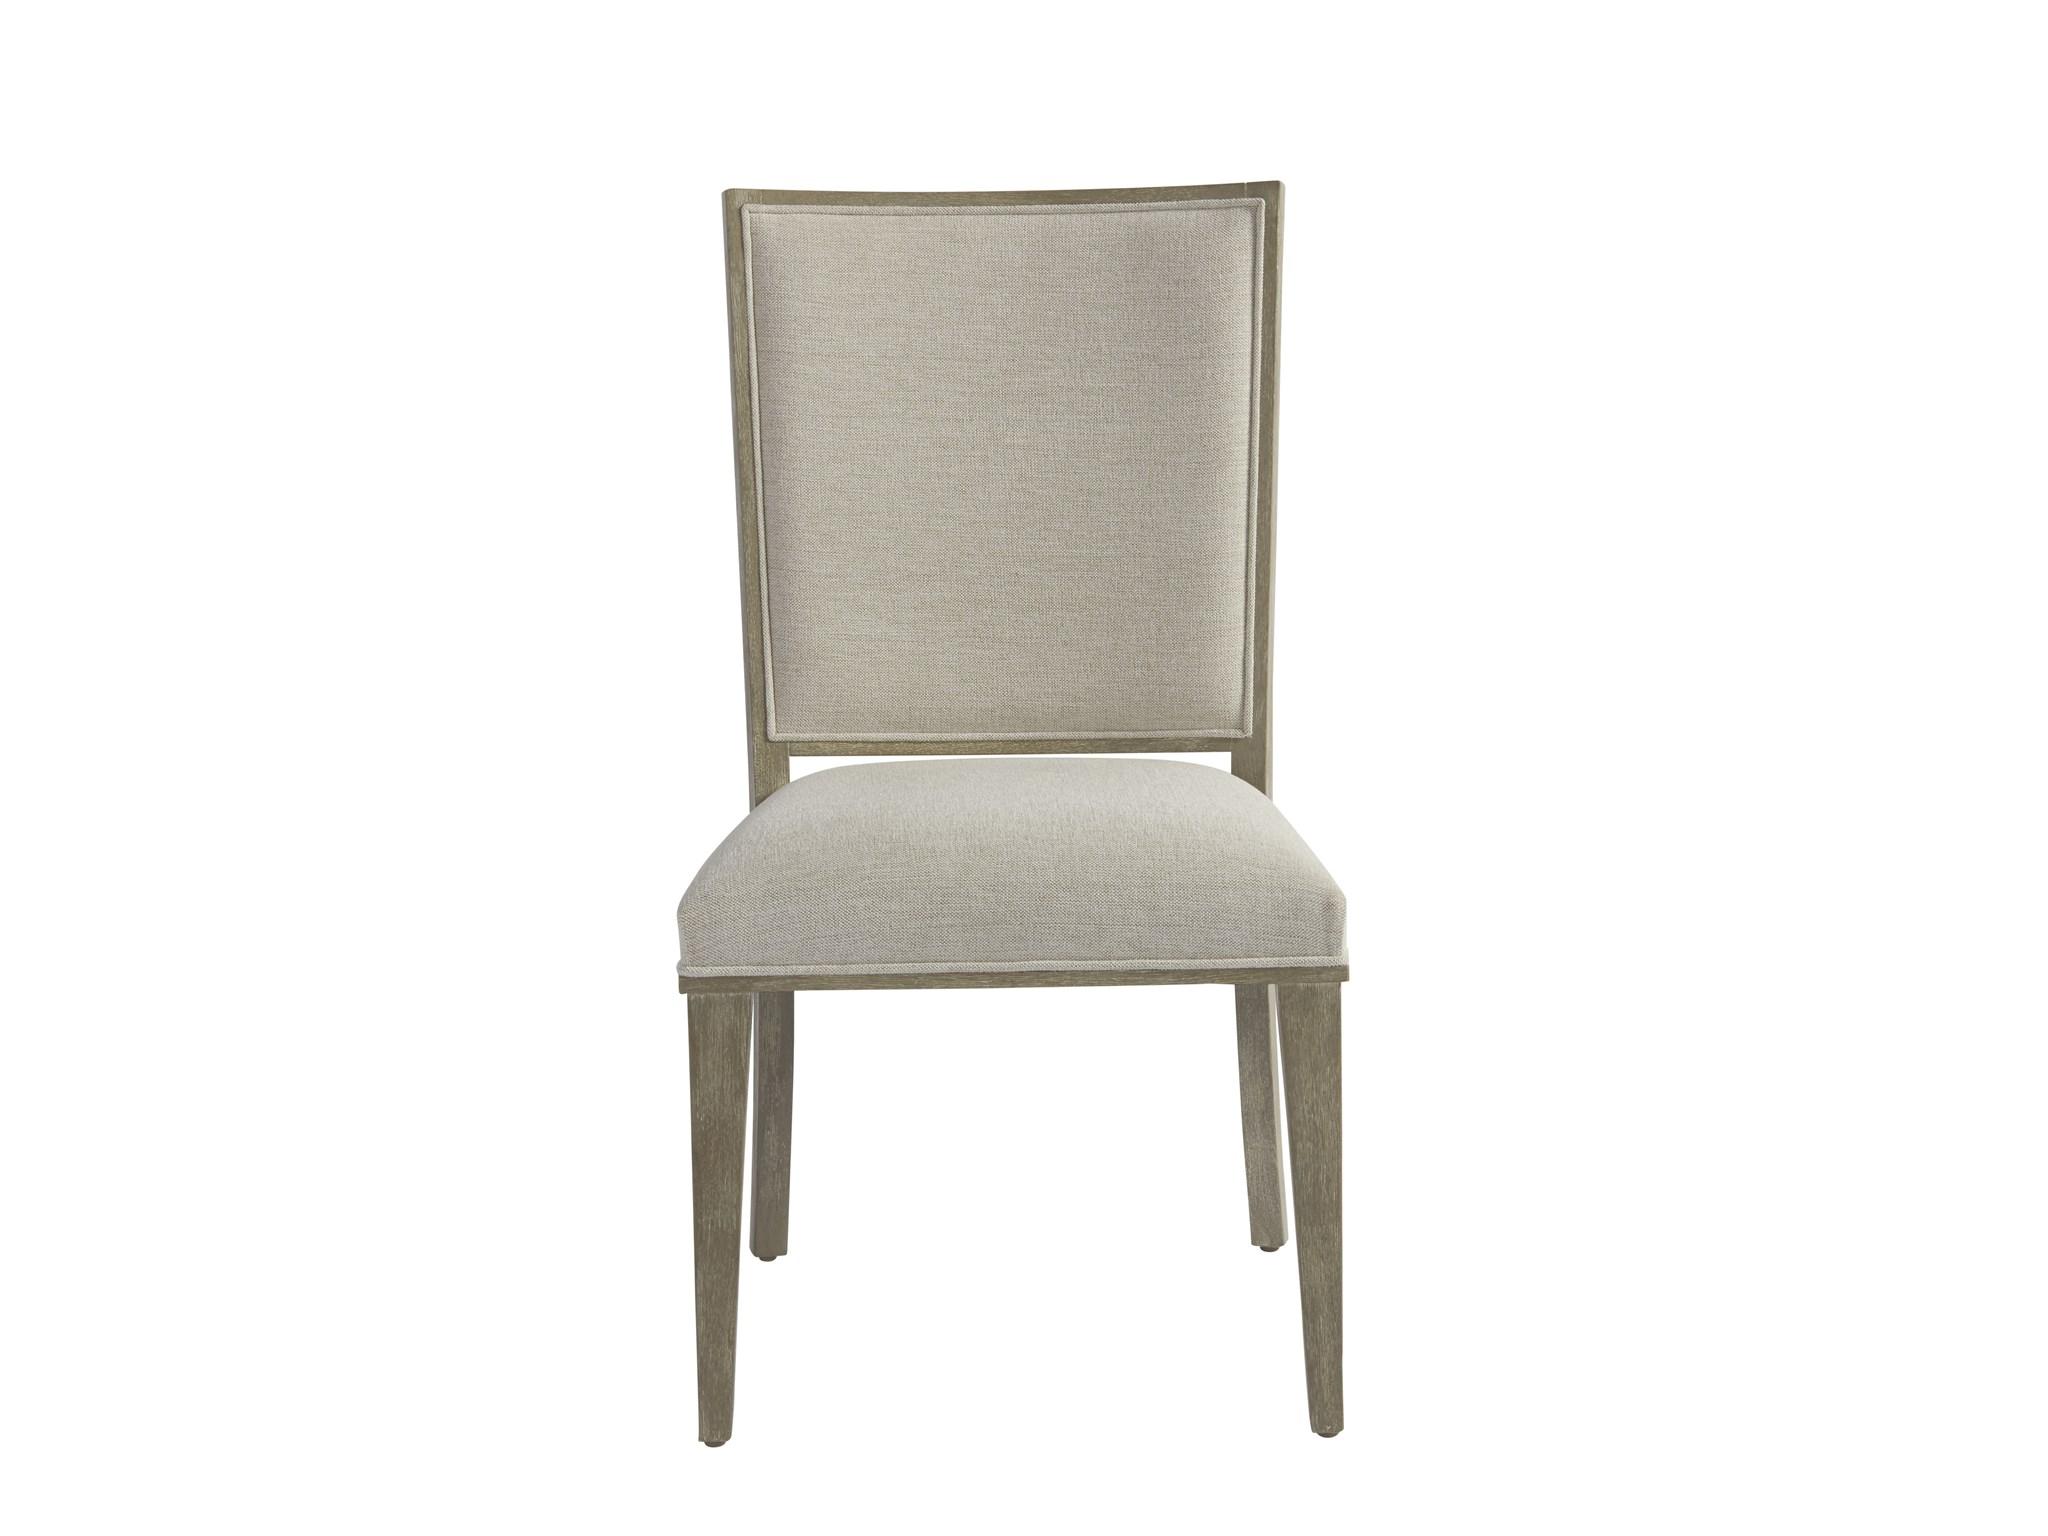 zephyr desk chair ergonomic rogan universal furniture side